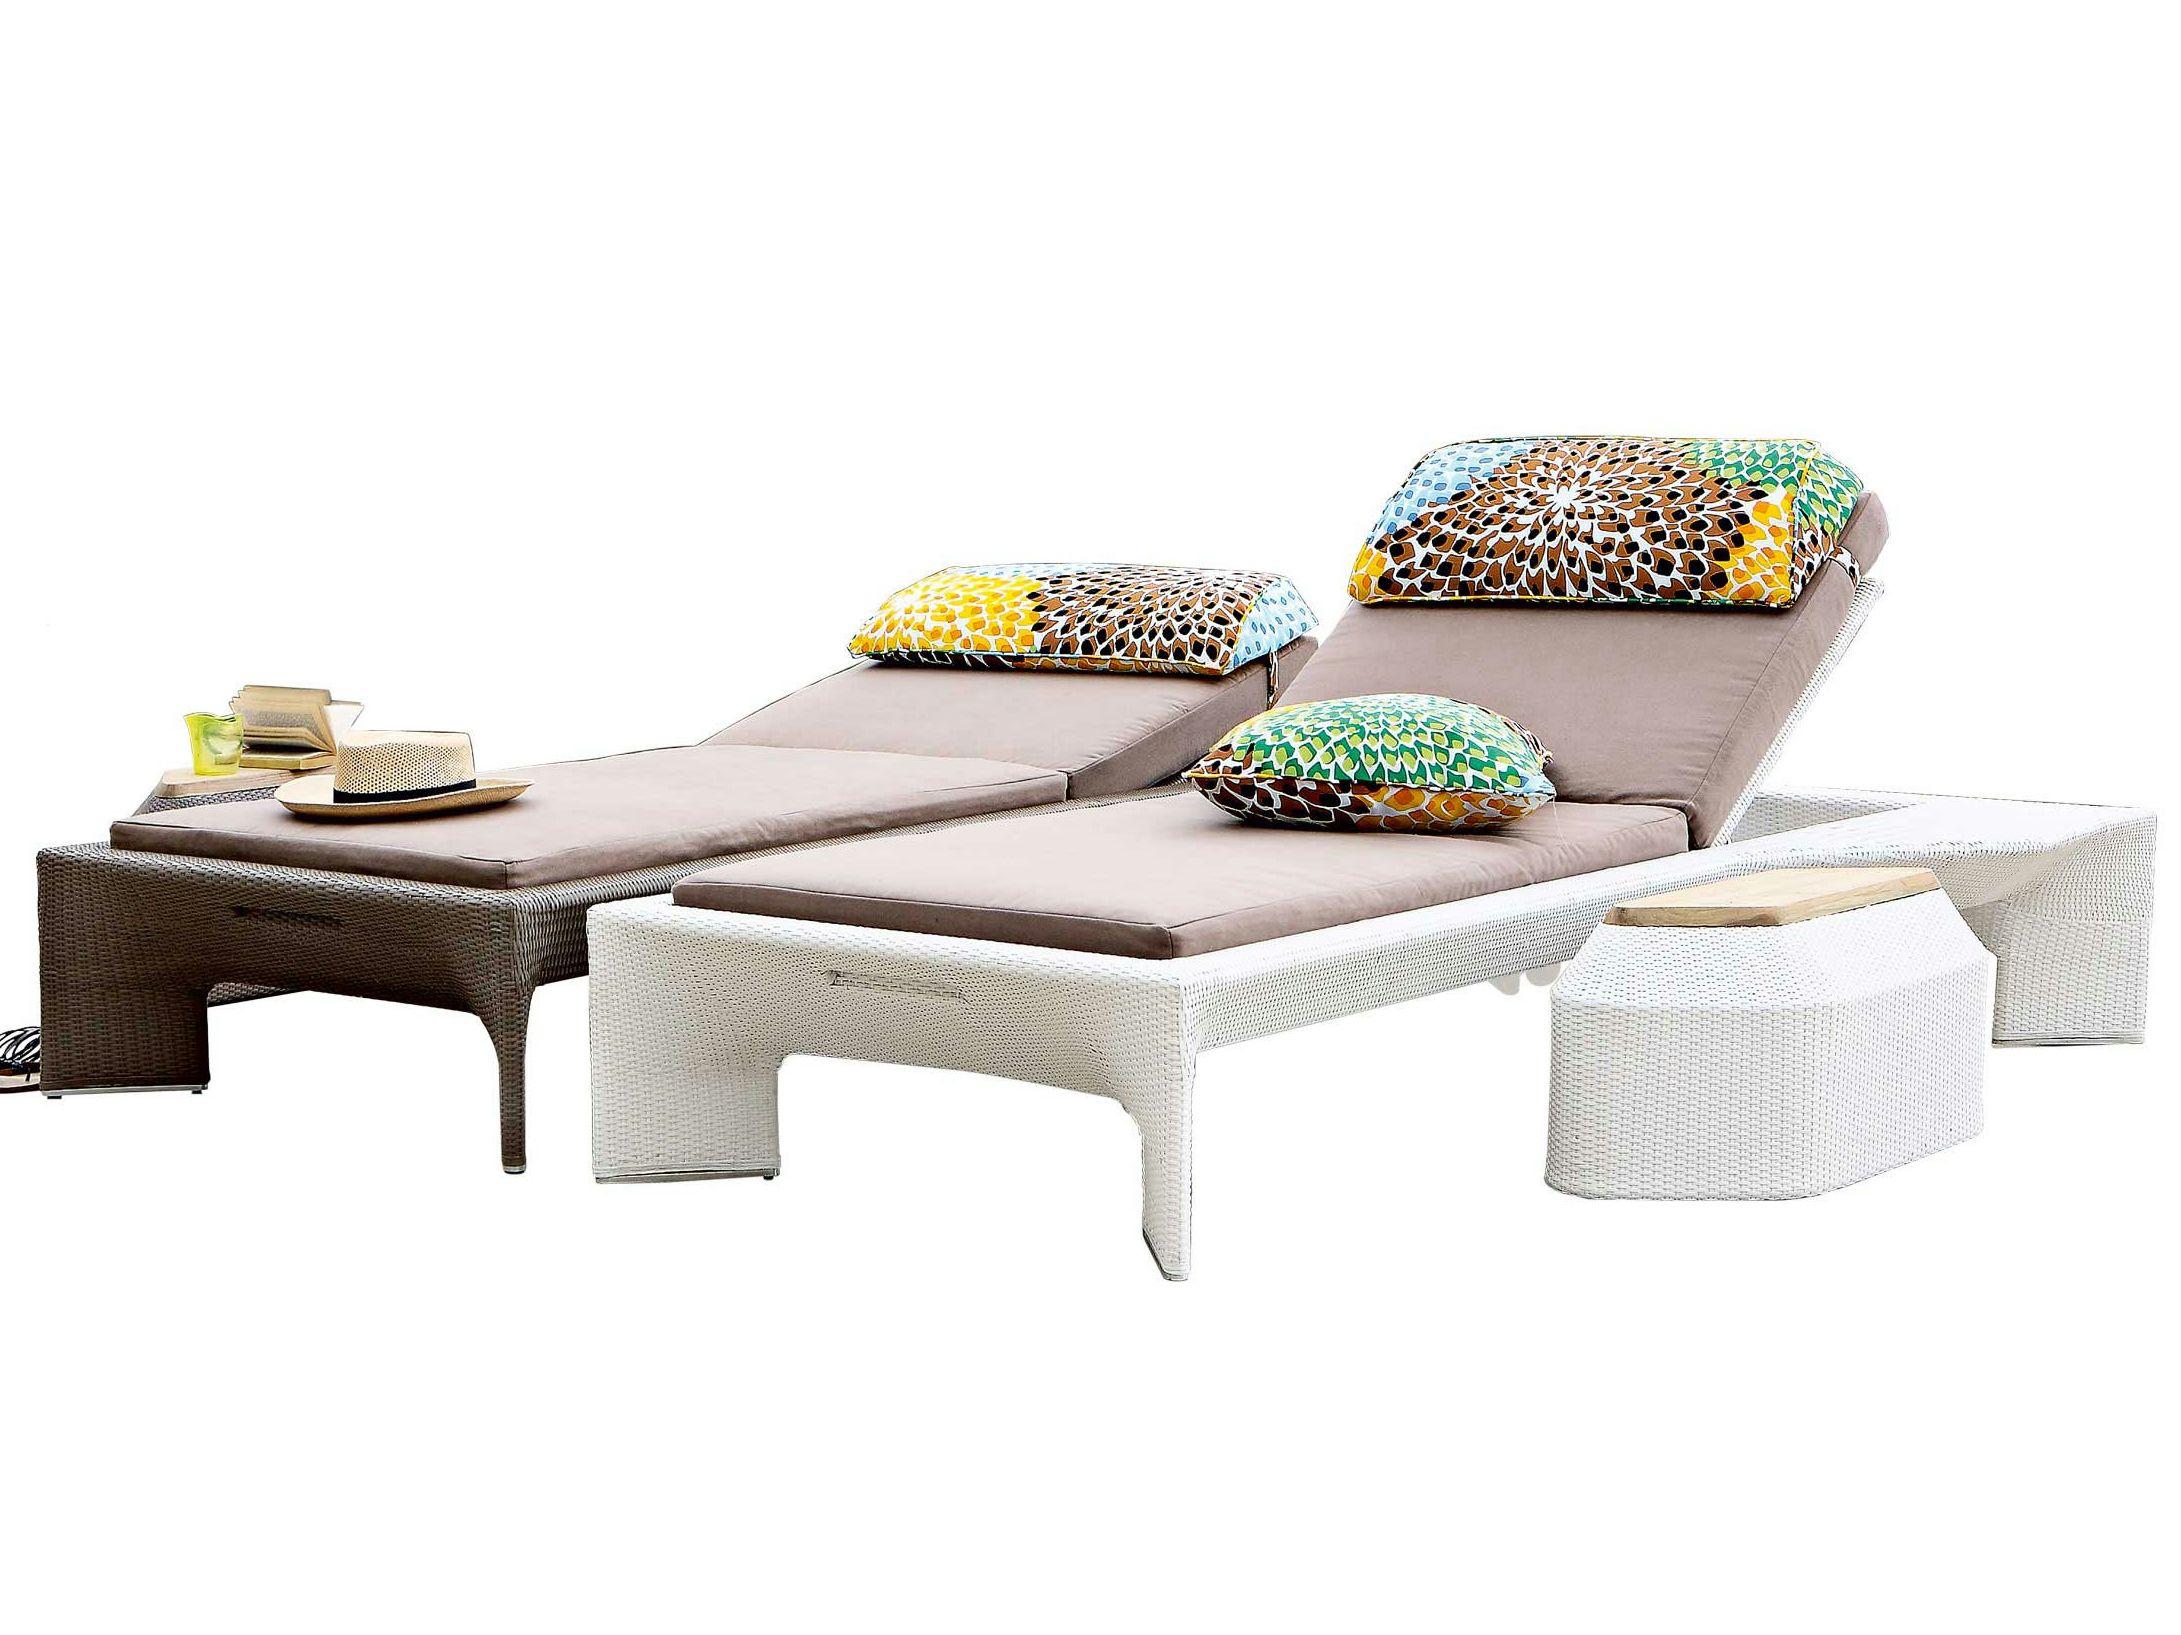 chaise longue estofada bel air cole o les contemporains. Black Bedroom Furniture Sets. Home Design Ideas